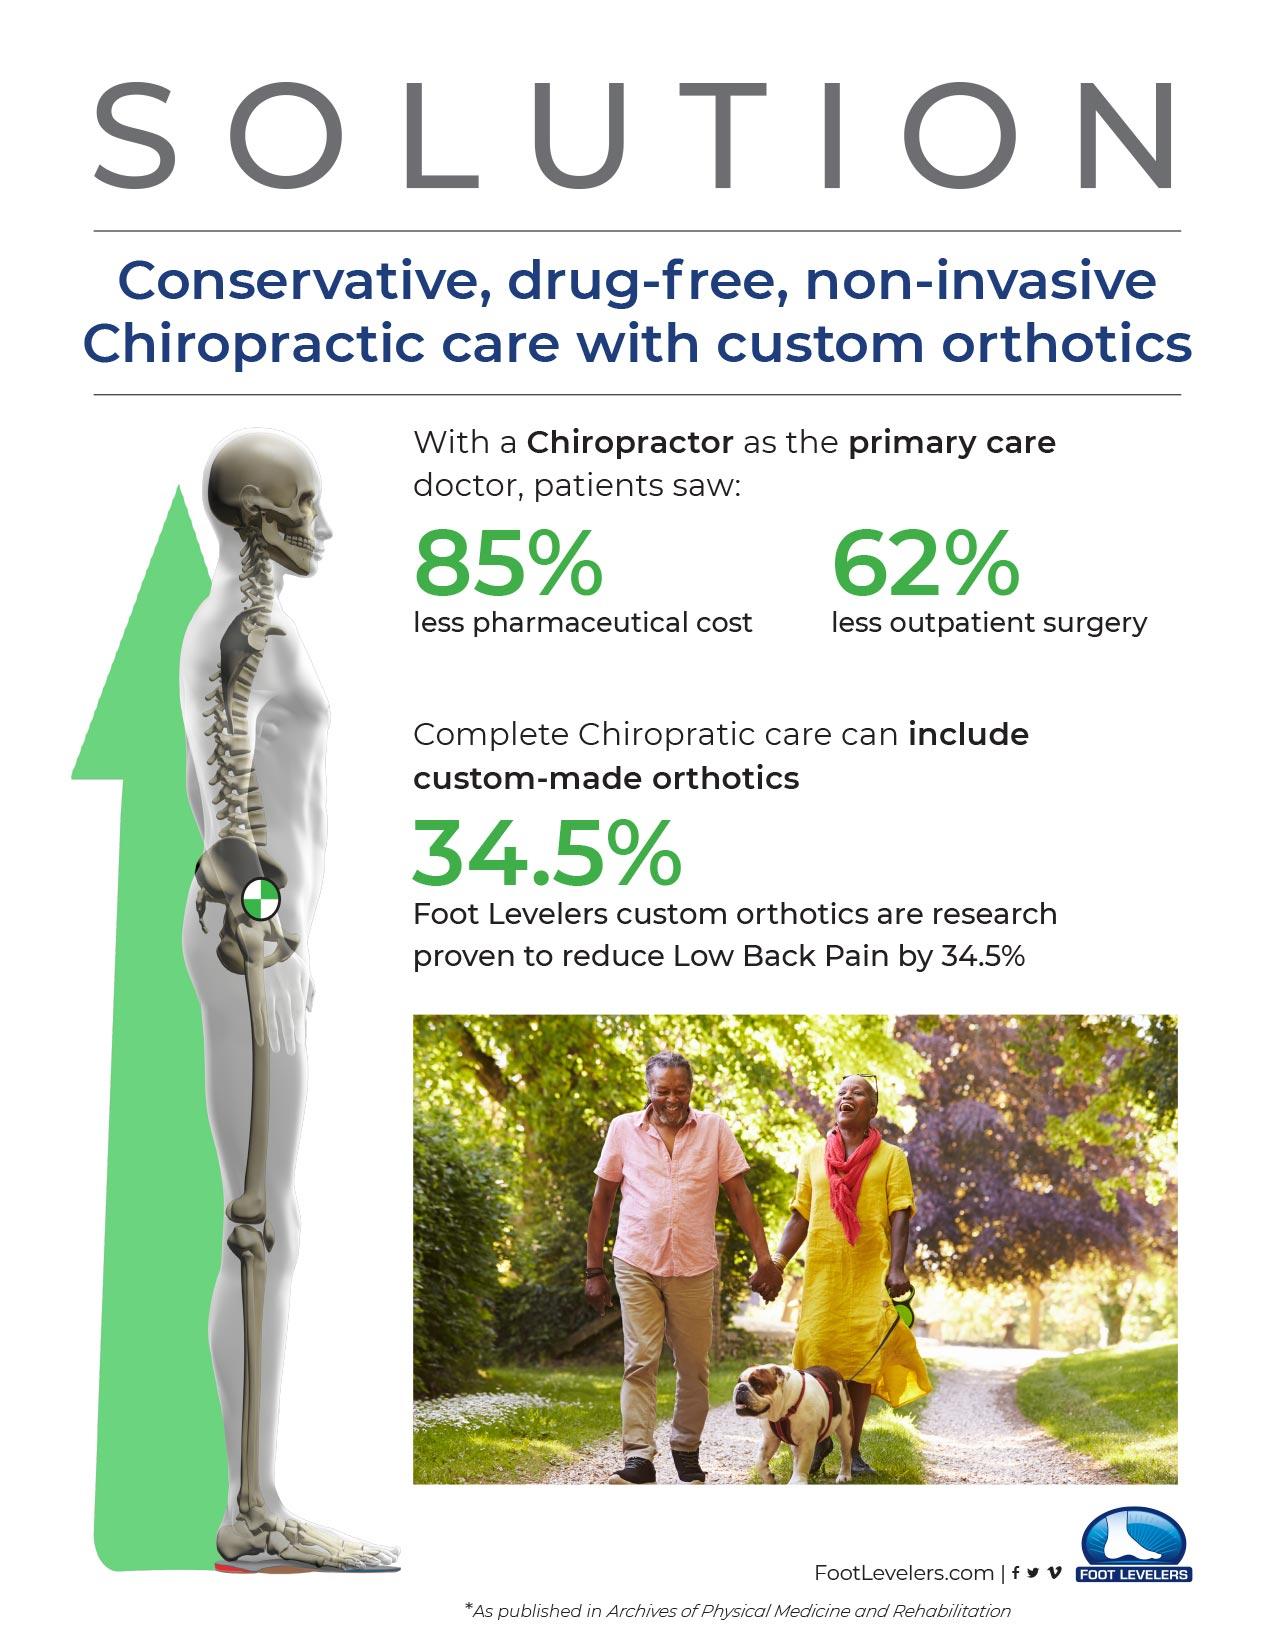 11860 Vista Del Sol Dr #128, Rheumatoid Arthritis And What To Know El Paso, Texas